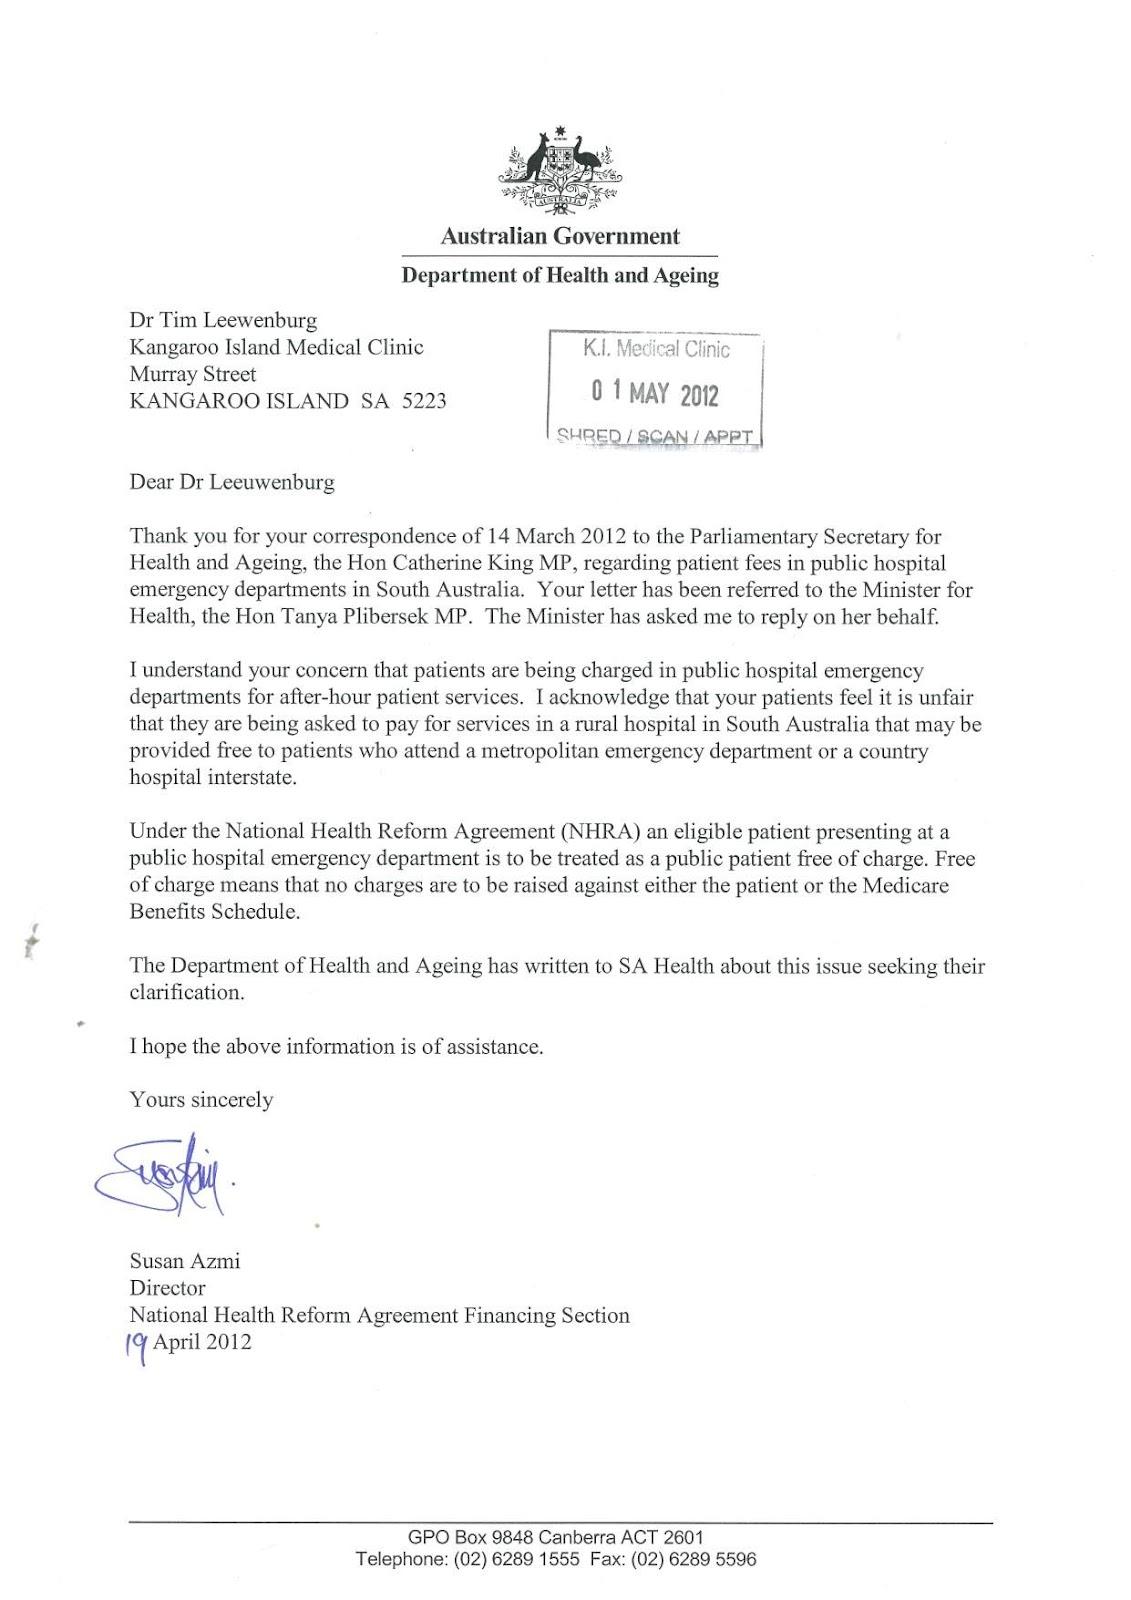 Resignation Letter Example Australia – Resignation Letter Australia